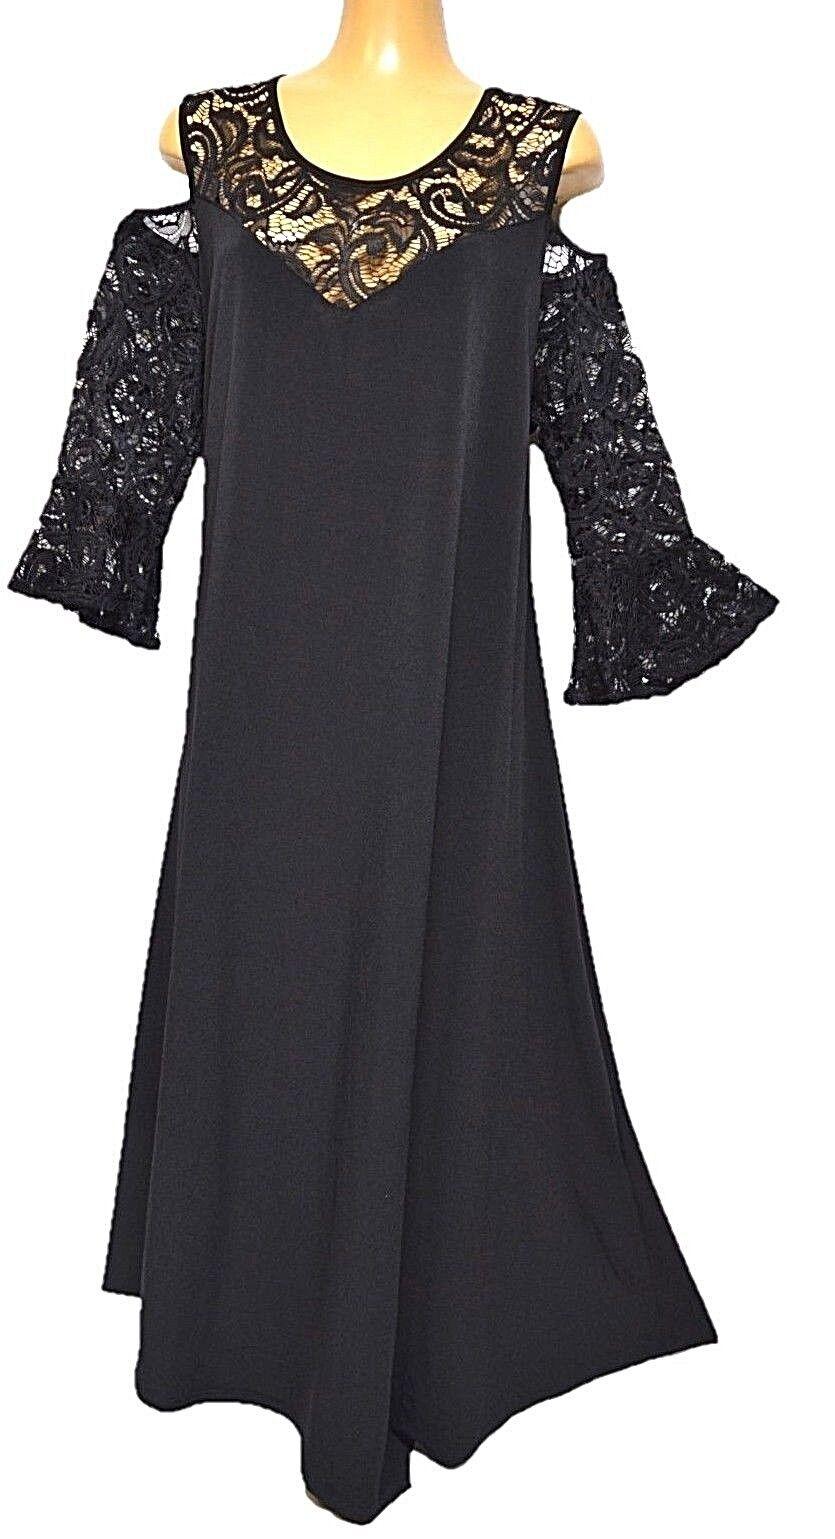 a75a4343db6be TS dress TAKING SHAPE plus sz M 18 - 20 Dress stretch lace NWT rrp ...